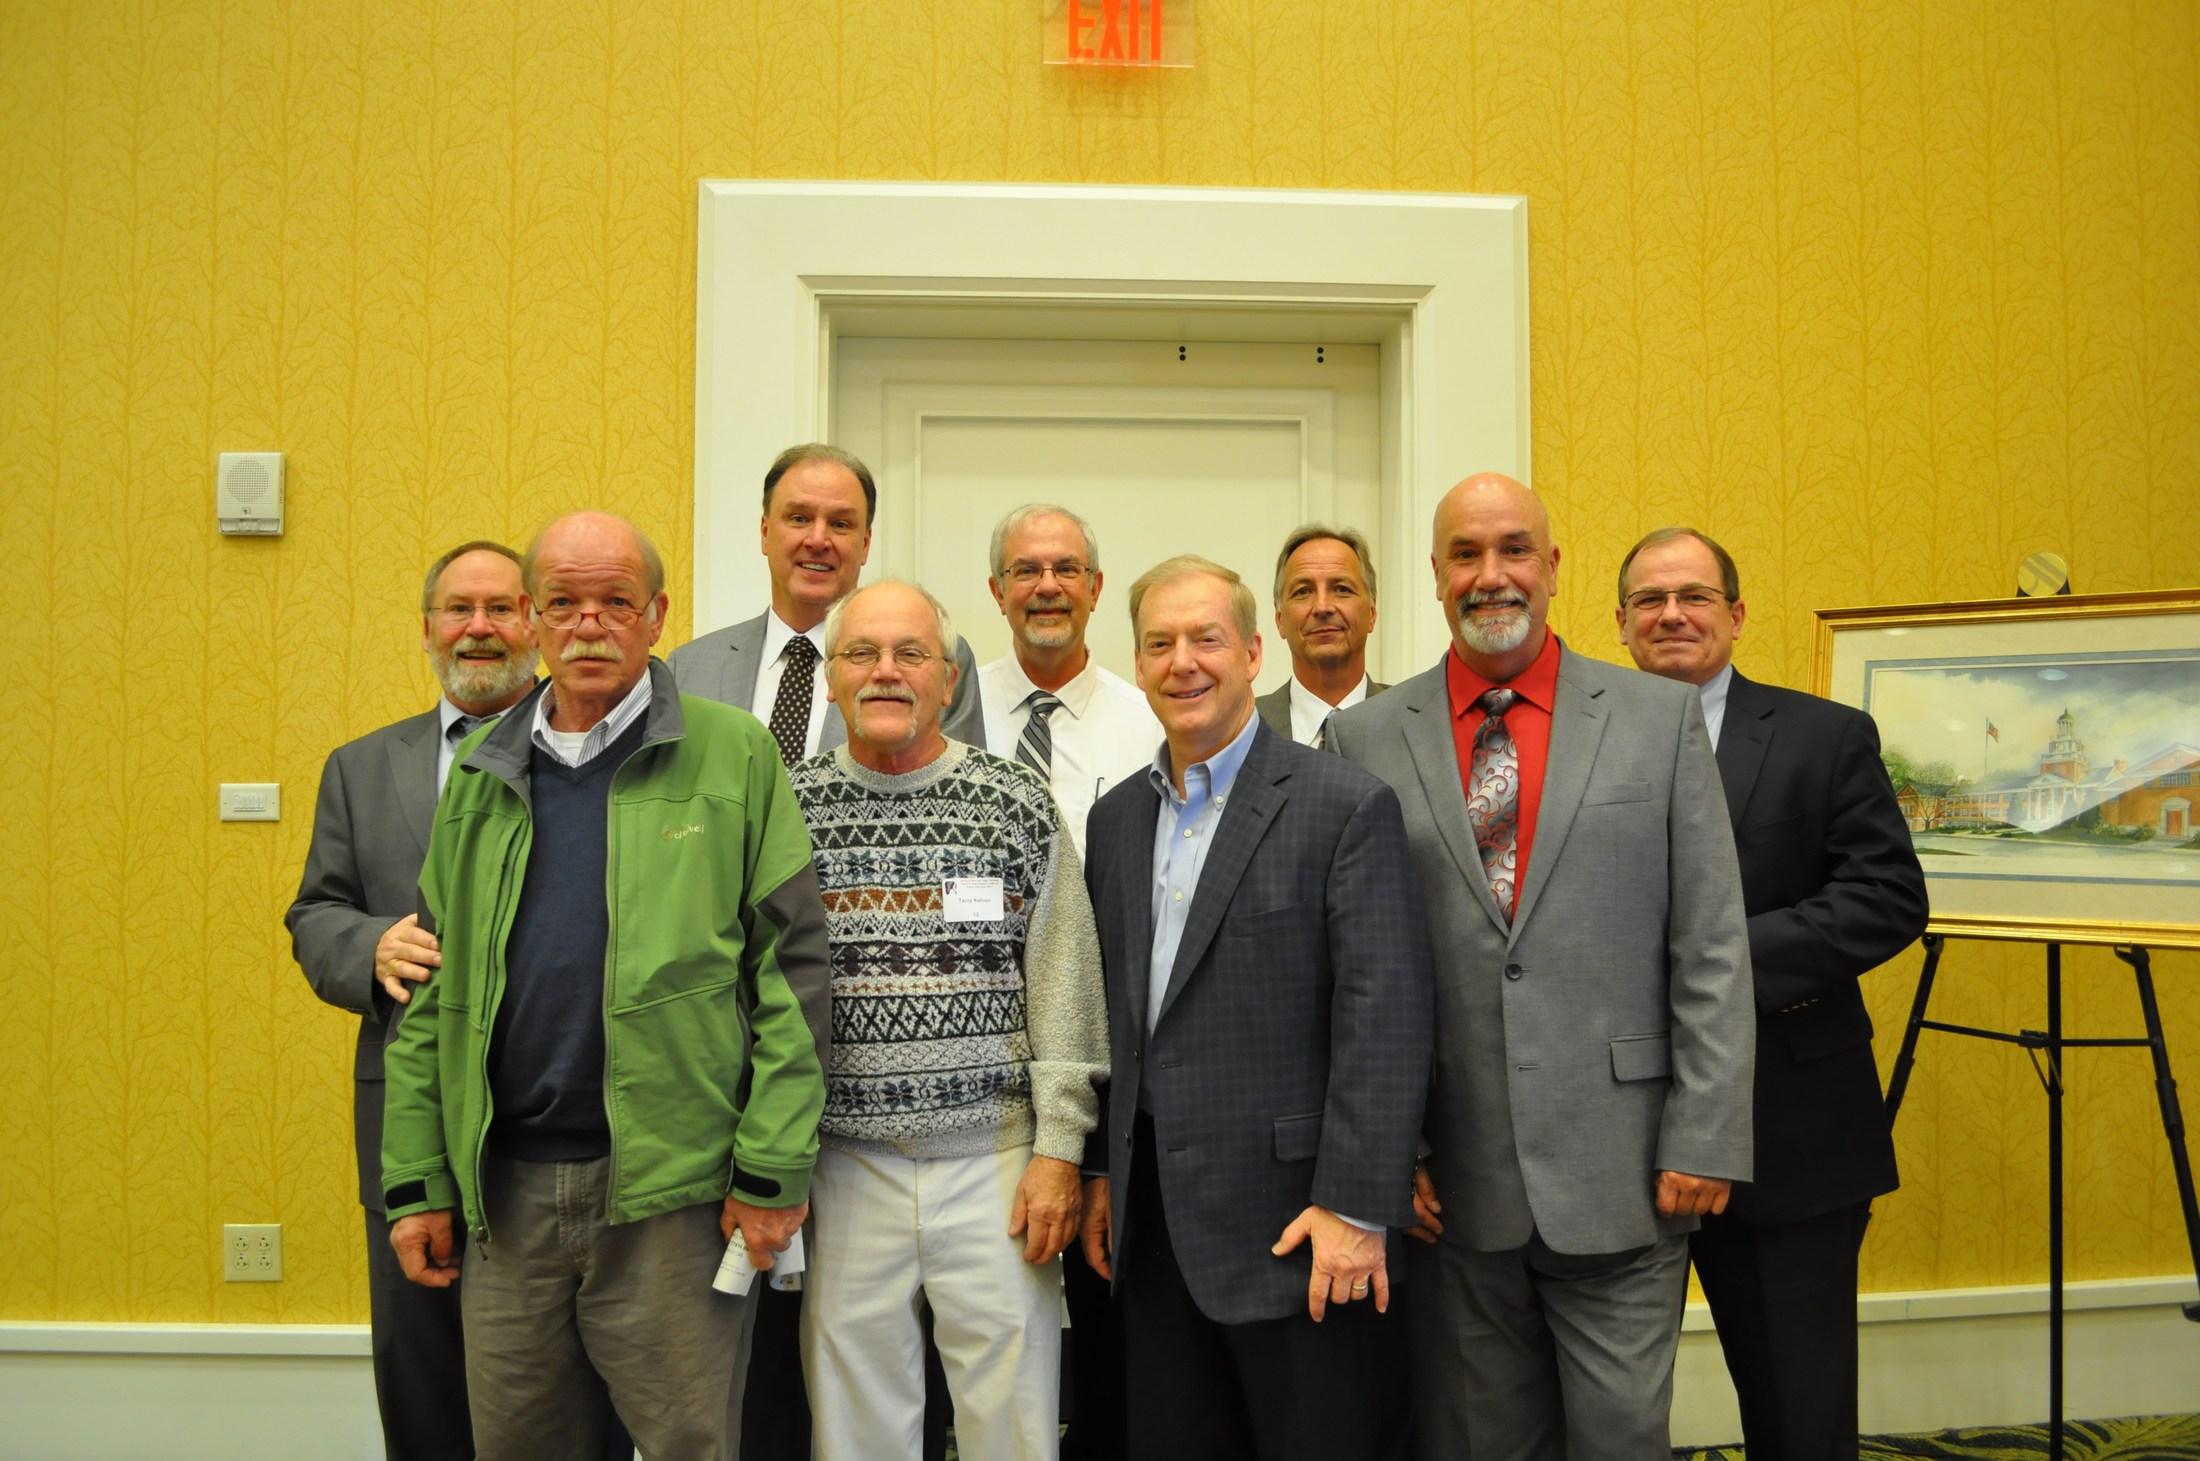 Dobyns Bennett Alumni Hall Of Fame Alumni Hall Of Fame